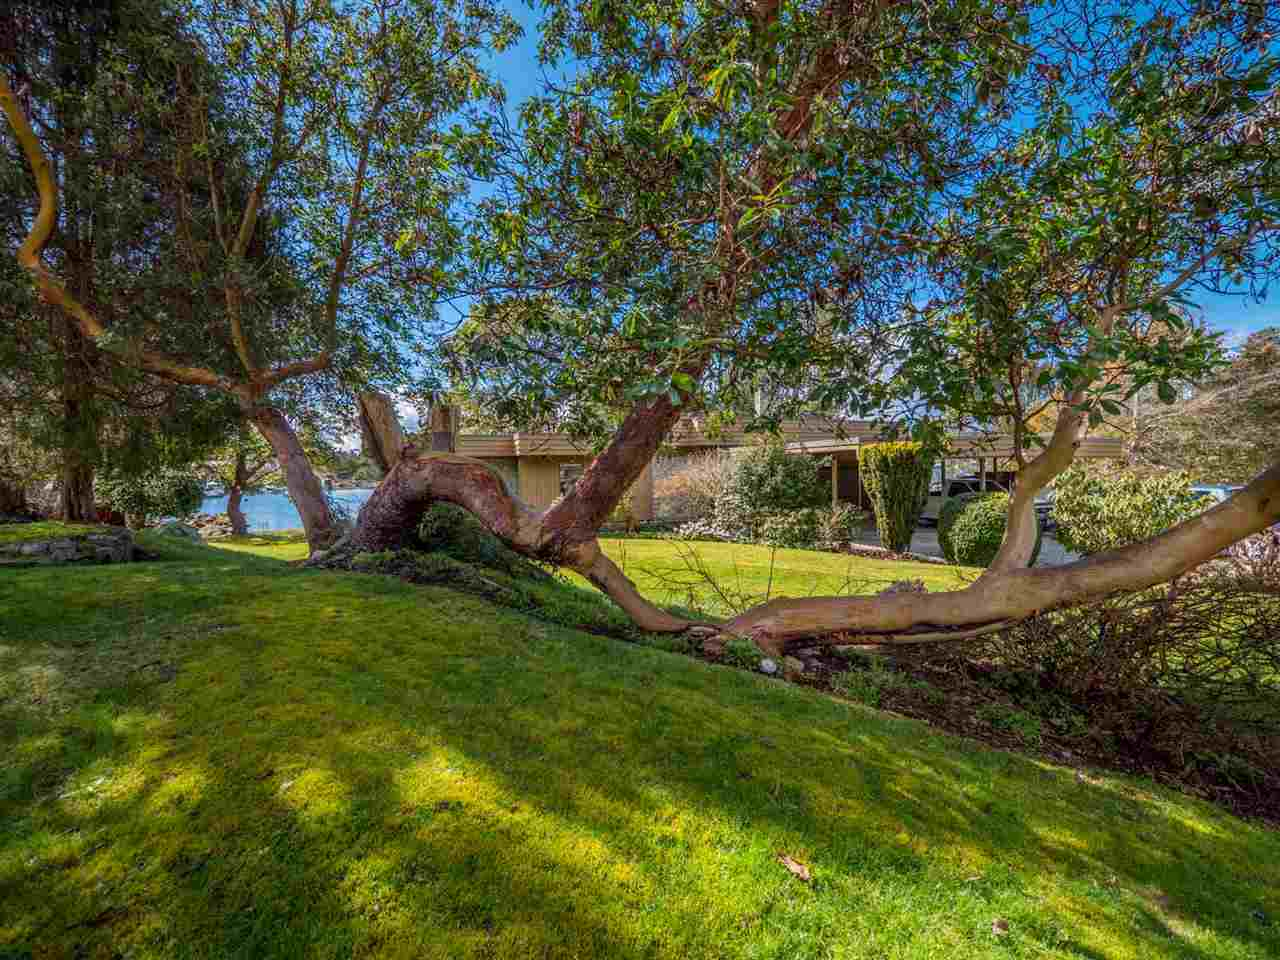 4950-gonzales-road-pender-harbour-egmont-sunshine-coast-03 at 4950 Gonzales Road, Pender Harbour Egmont, Sunshine Coast